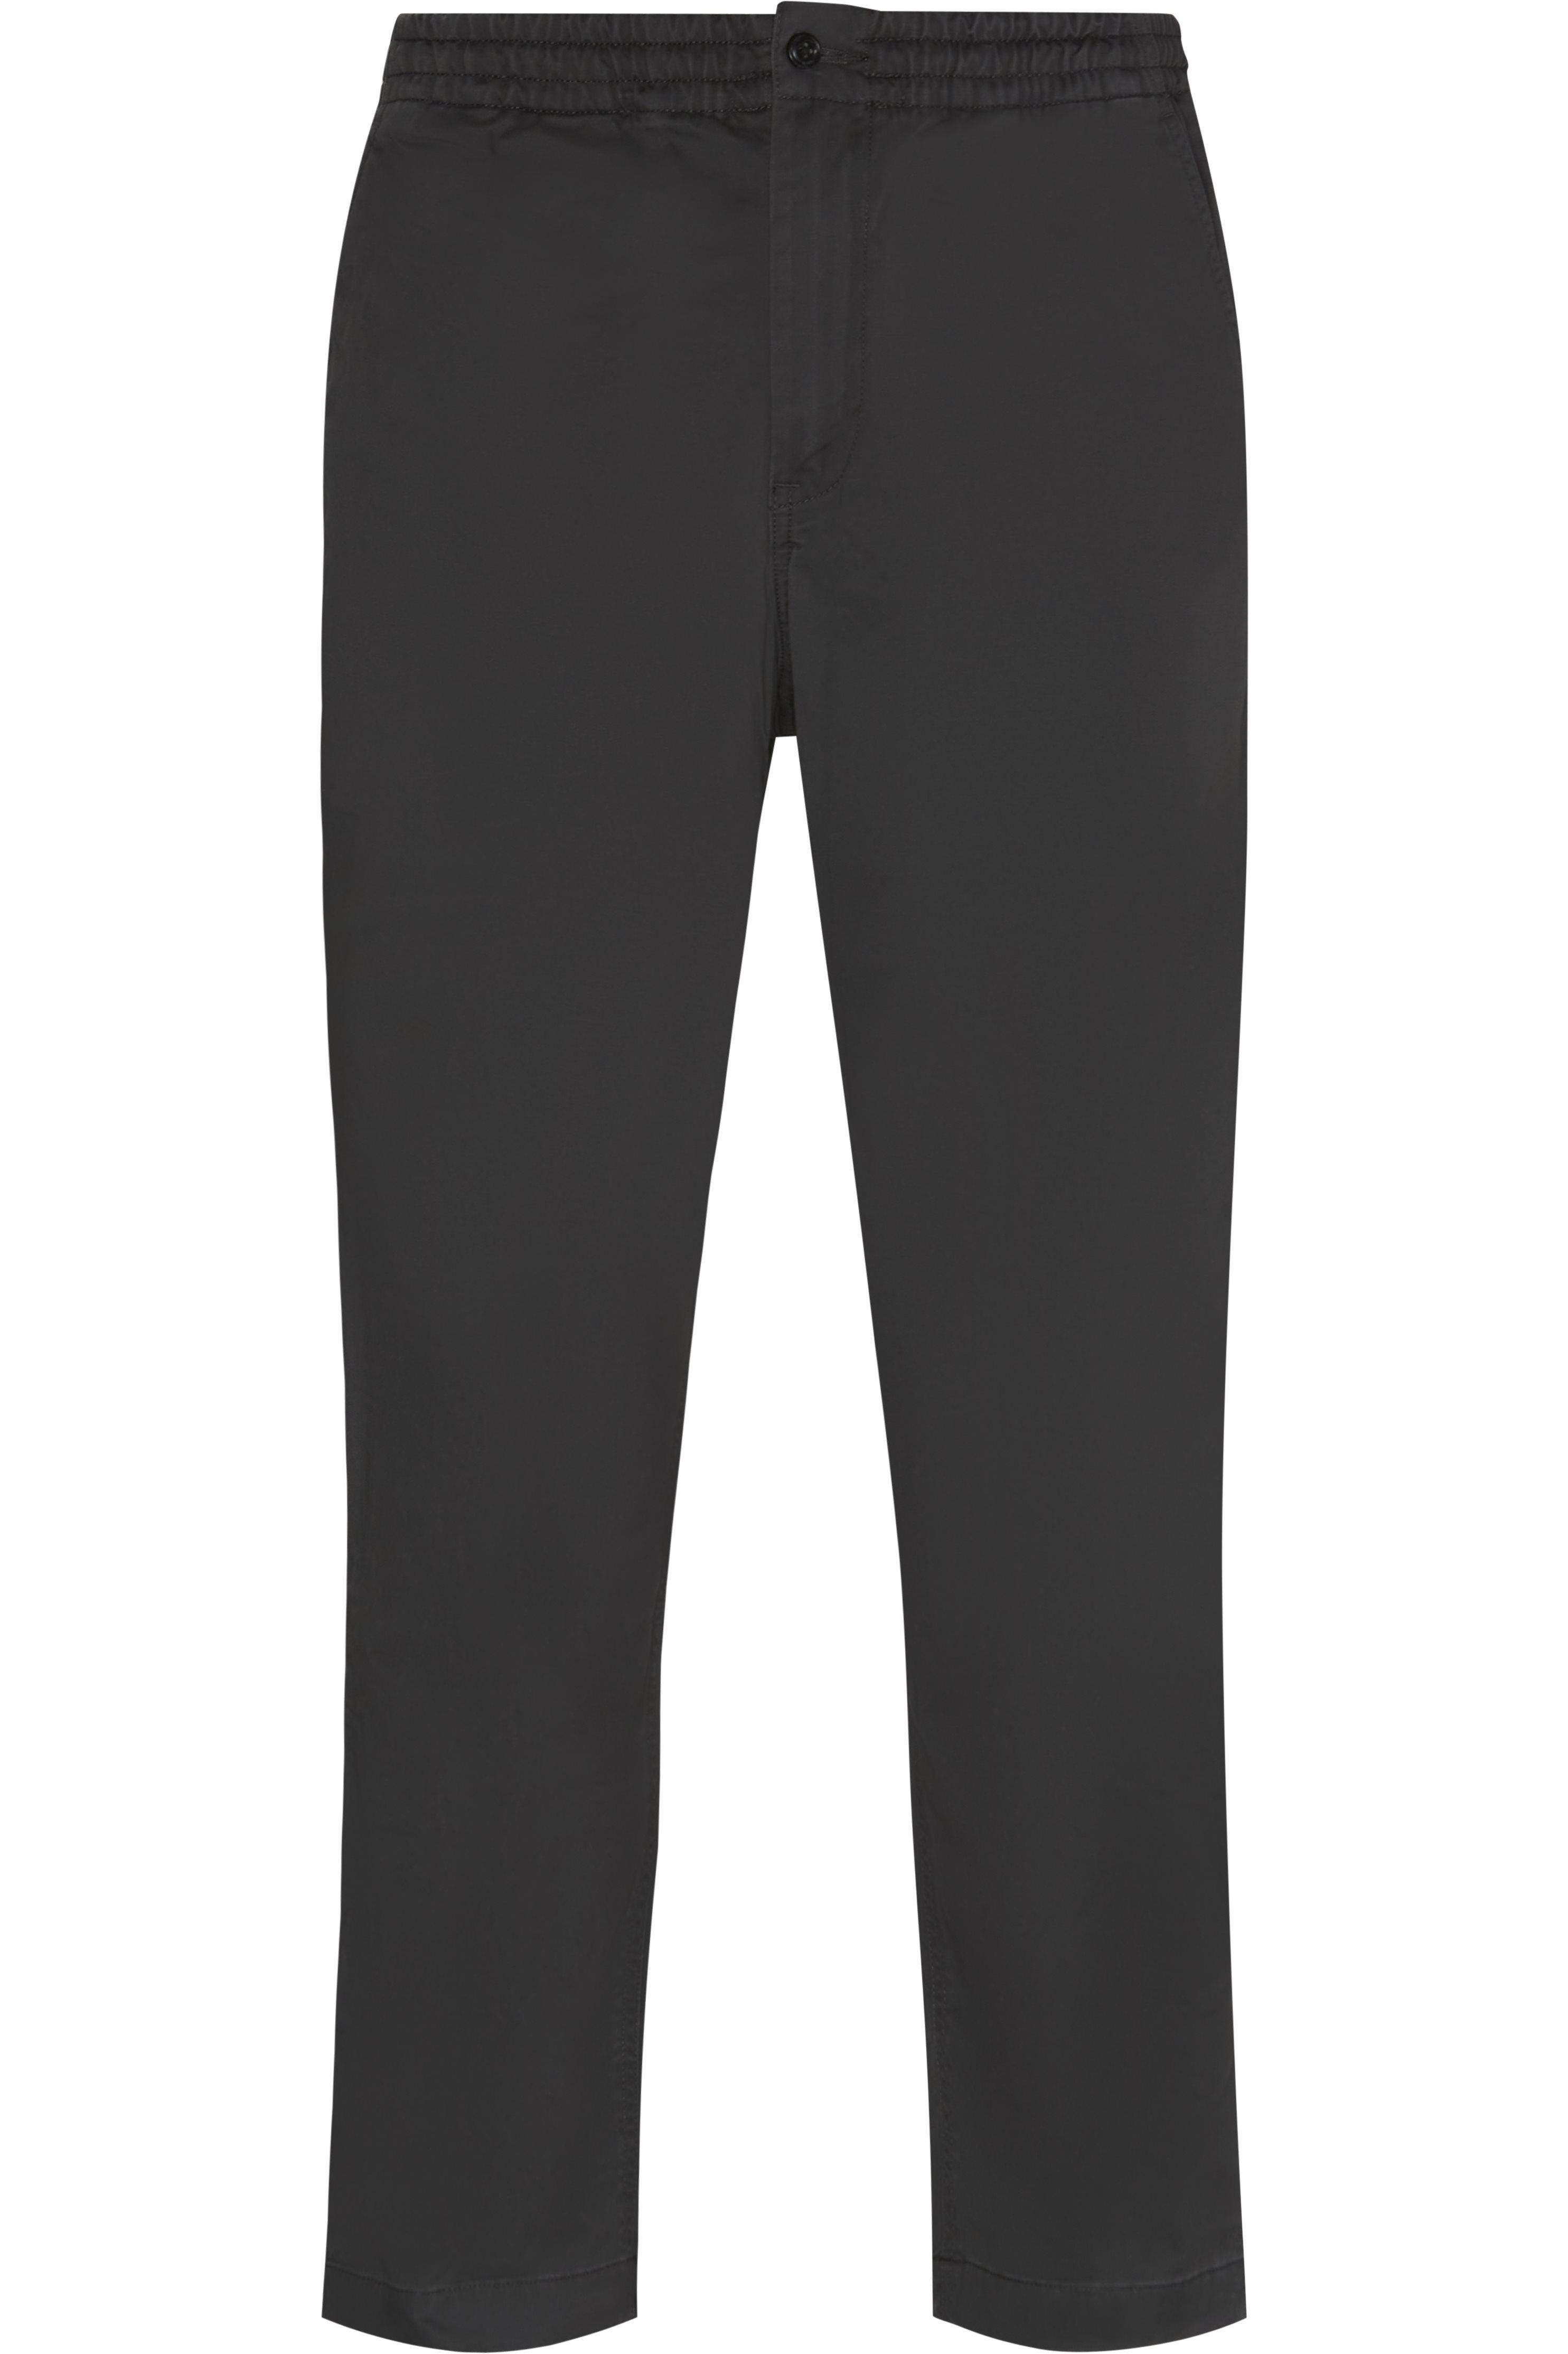 Logo Comfort Pant - Byxor - Regular - Grå